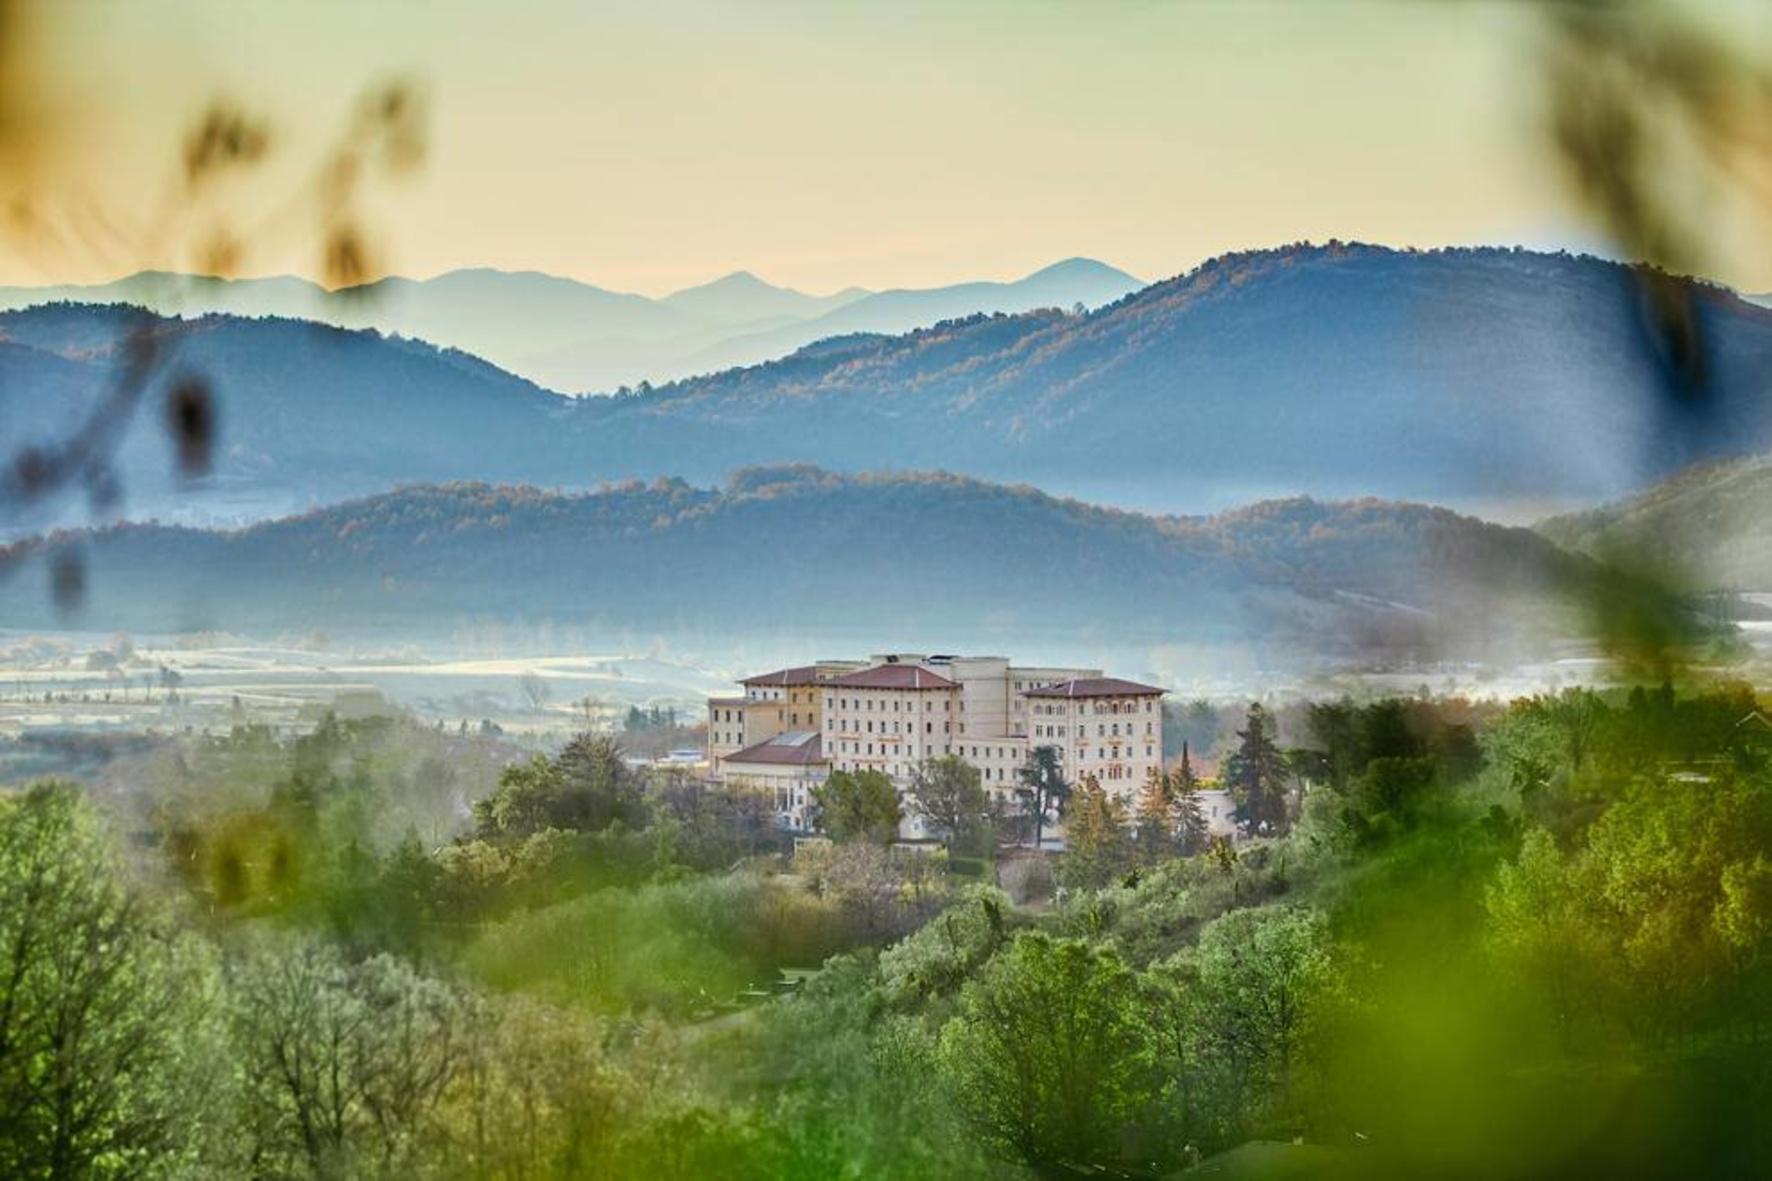 Отель Palazzo Fiuggi: легенда Италии